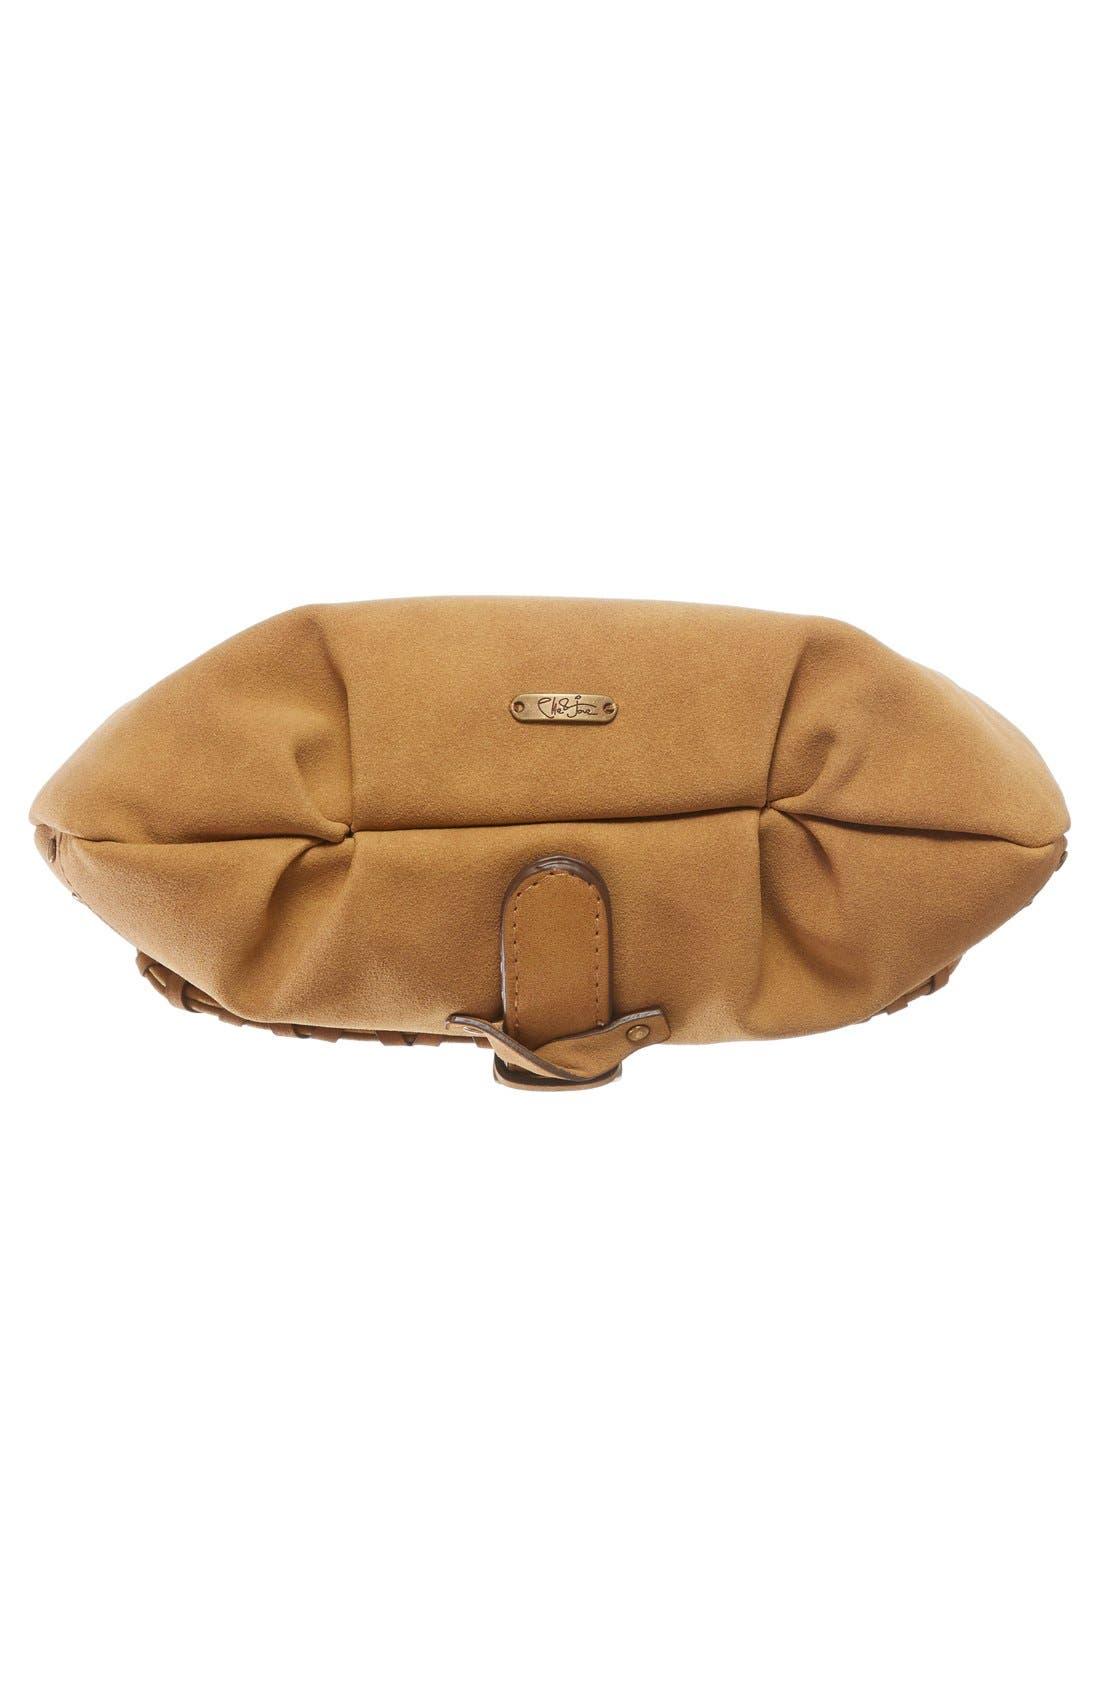 Alternate Image 4  - Elle & Jae Gypset Sevilla Studded Faux Suede Crossbody Bag